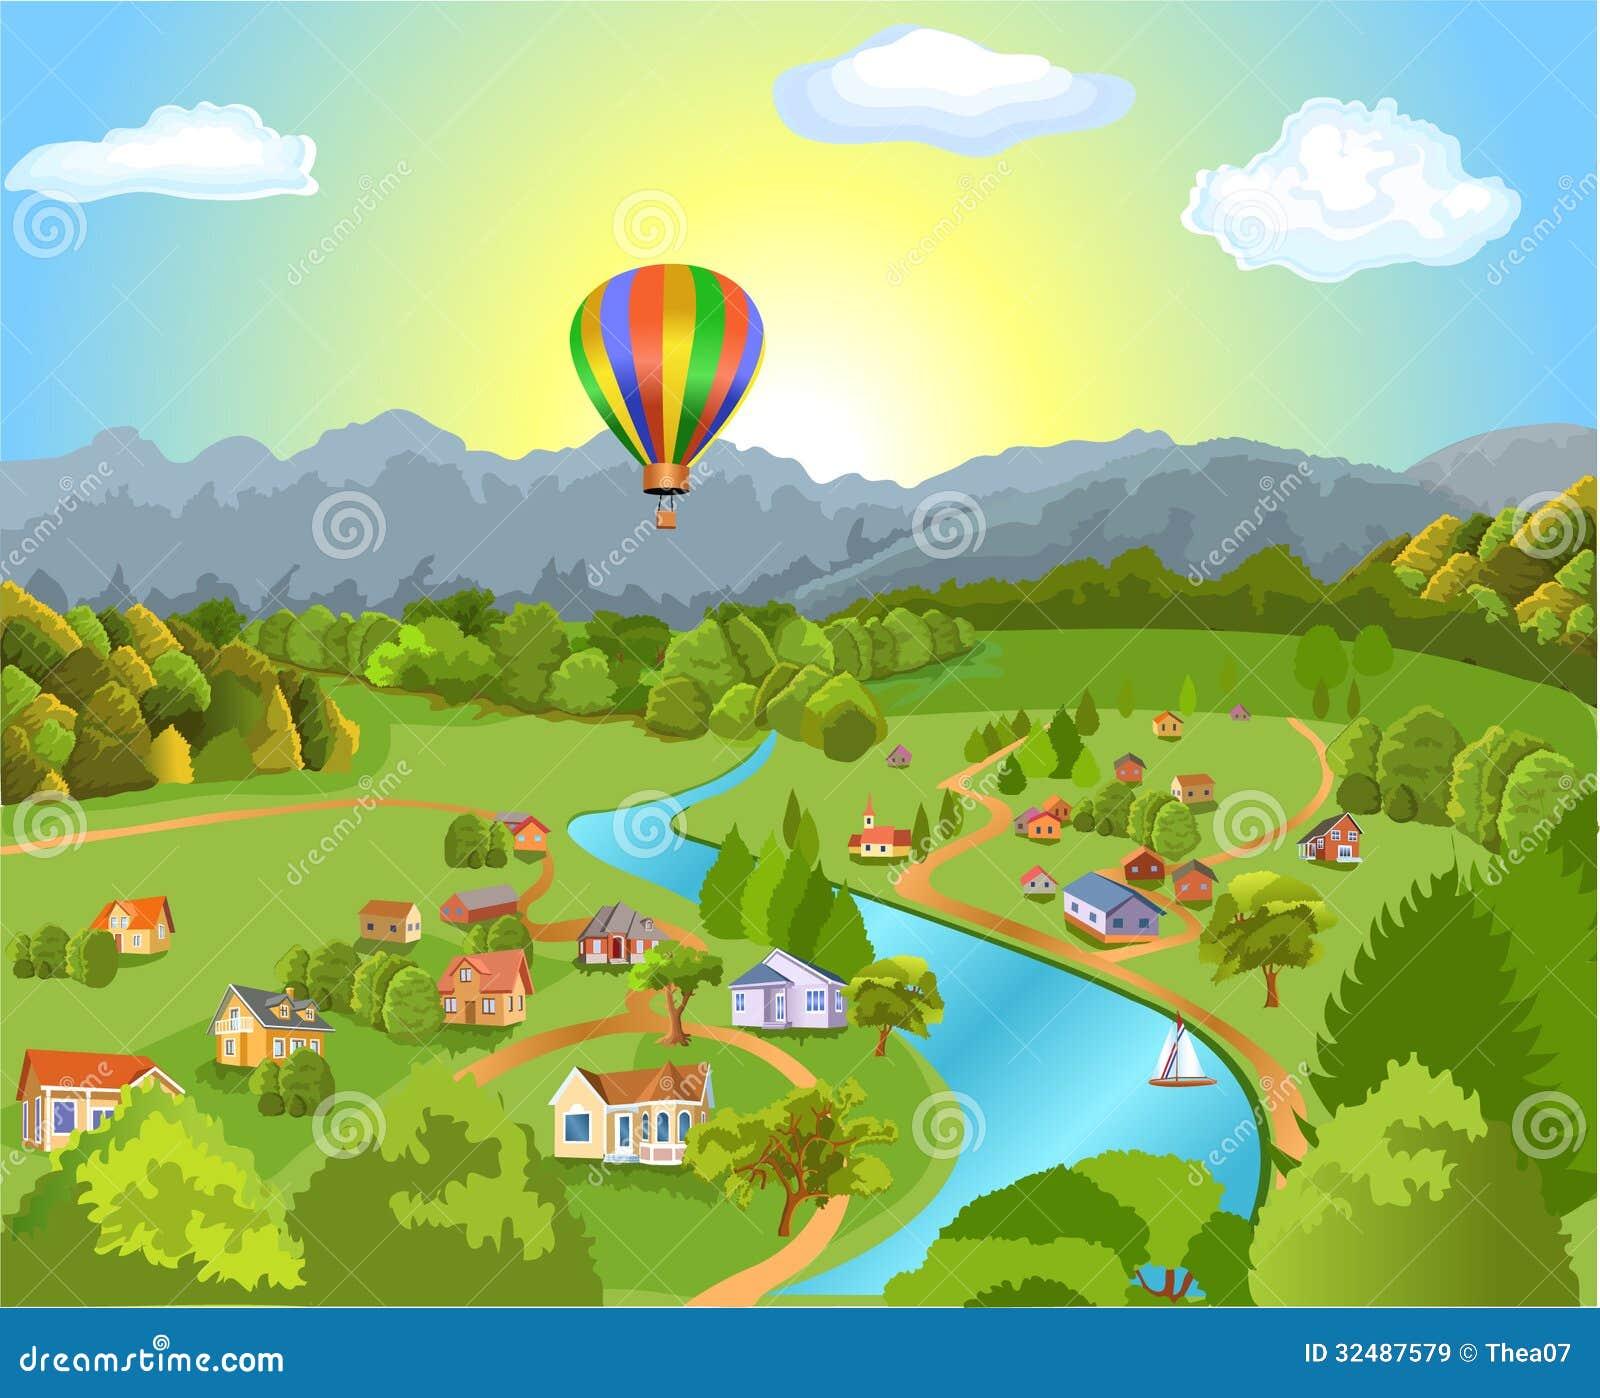 Landscape Illustration Vector Free: Panoramic Landscape Stock Vector. Illustration Of Tourist